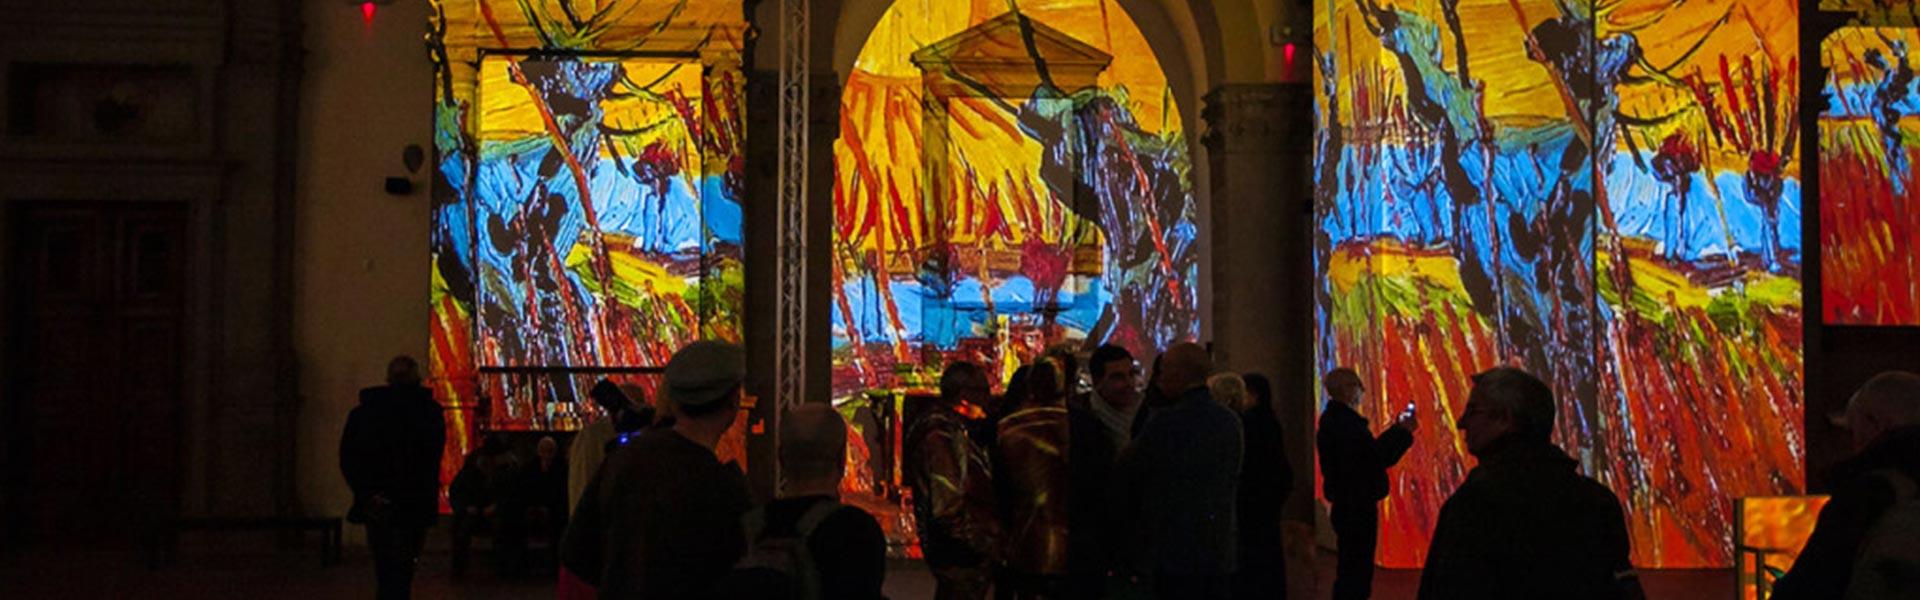 Van Gogh Alive – Welcome to Grande Exhibitions